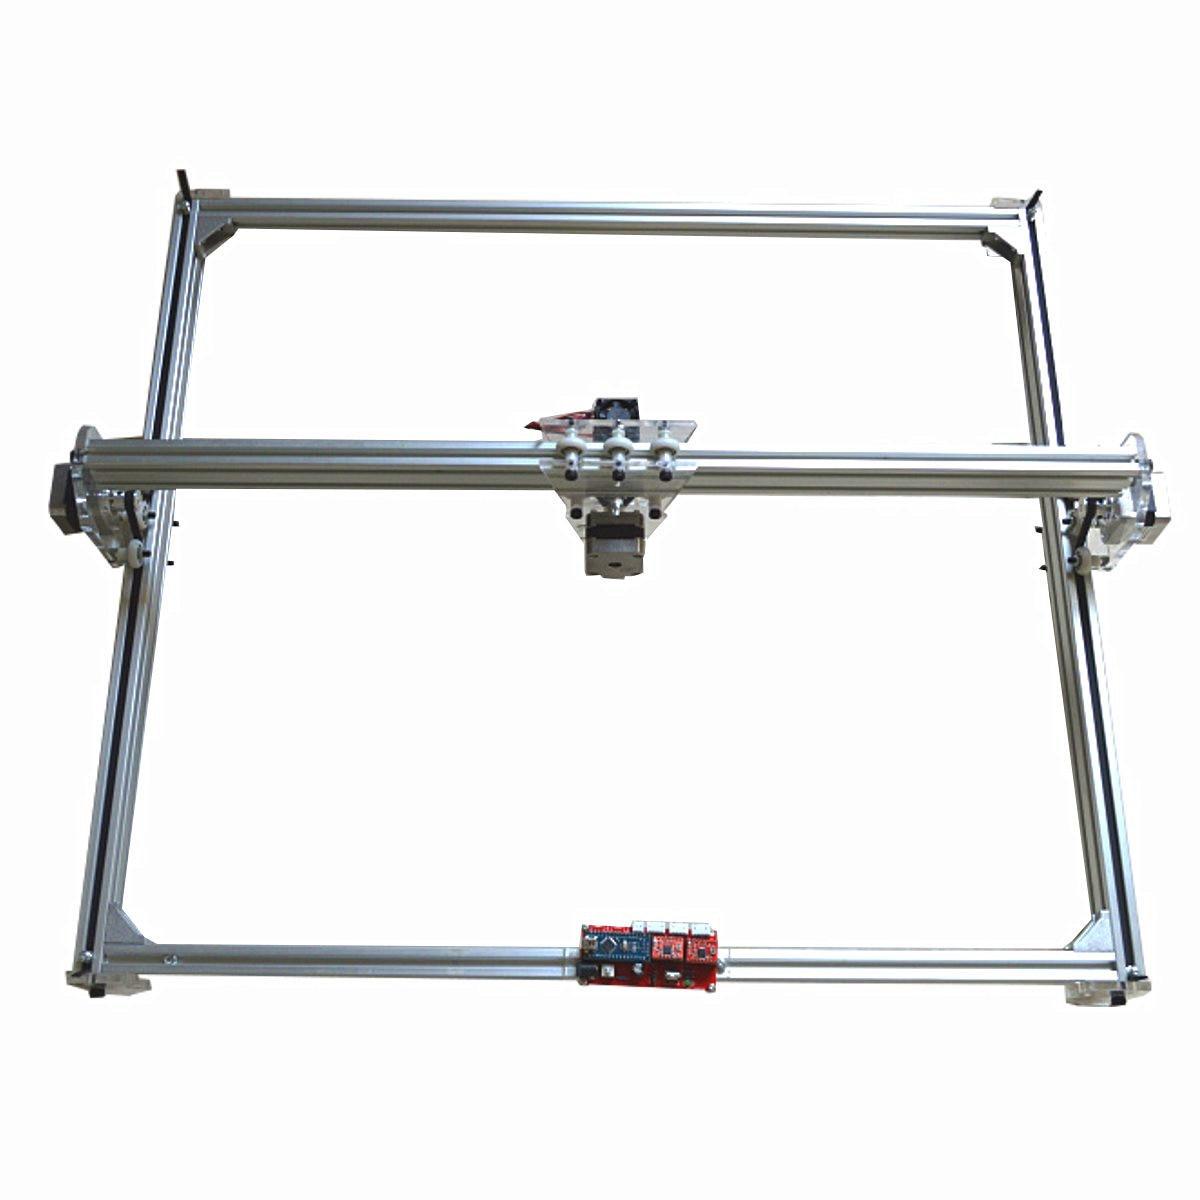 1Set 65x50cm 100 mw 5500 mw DIY Desktop Mini Lasersnijden/Graveren Graveur Machine DC 12V Hout Cutter/Printer/Power Verstelbare - 3